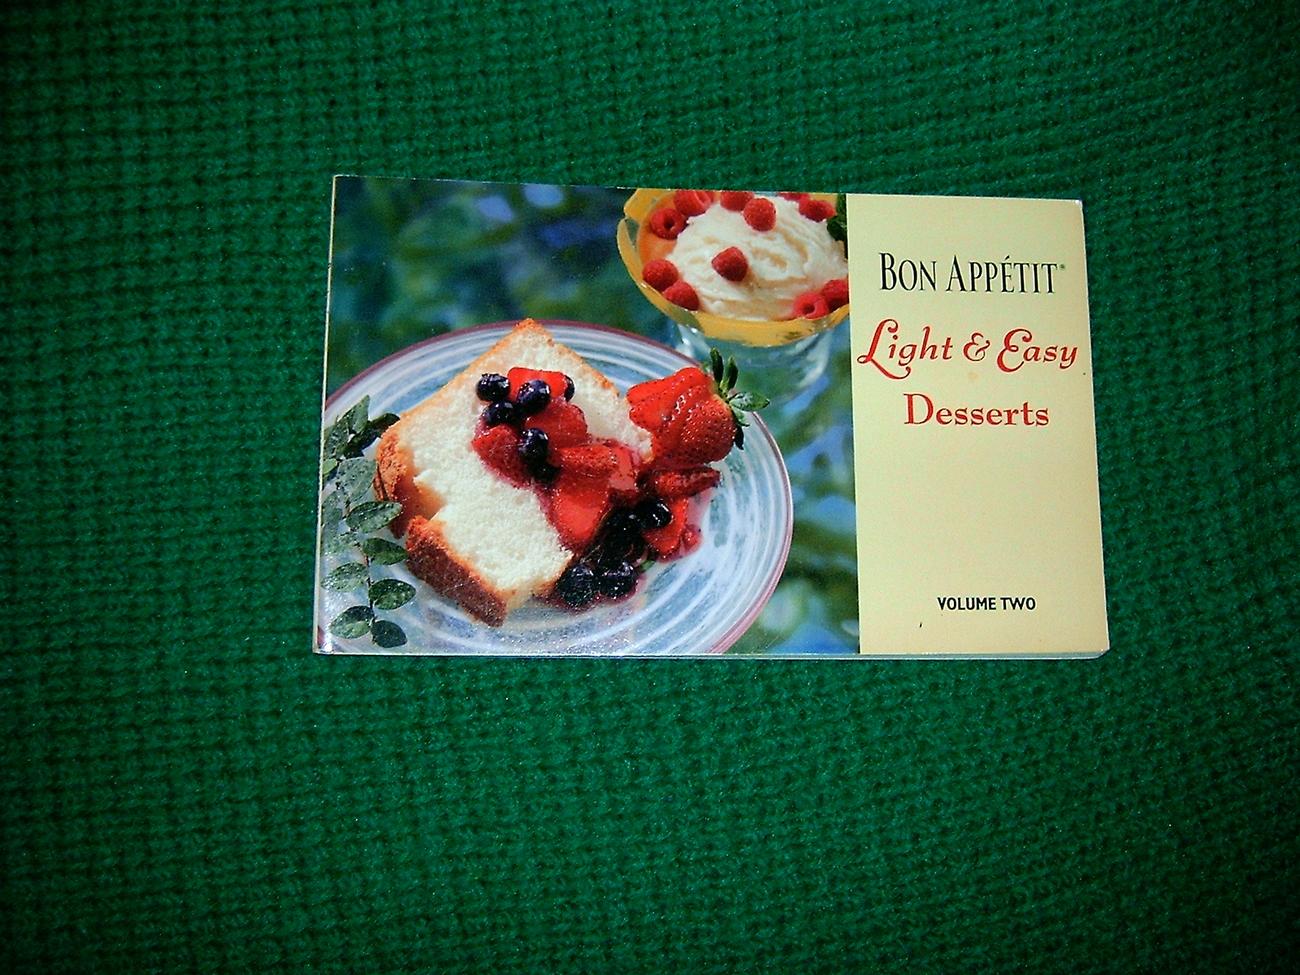 Bon Appetit Light & Easy Desserts Cookbook